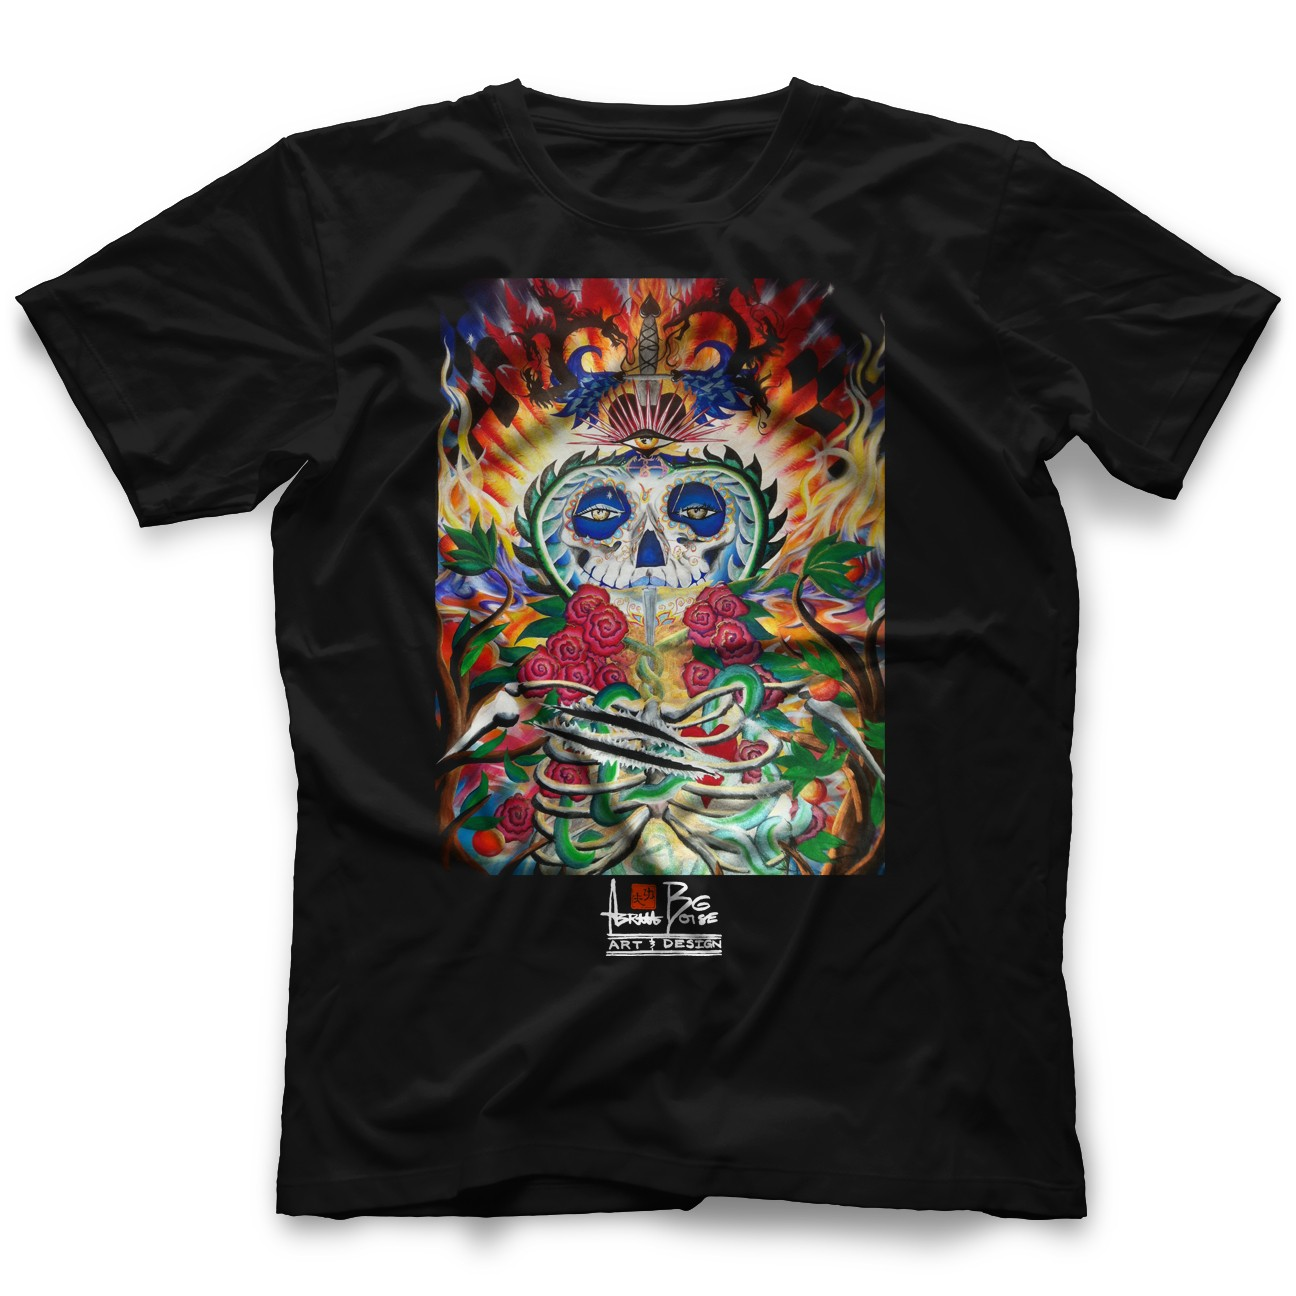 Abram boise life t shirt for Boise t shirt printing